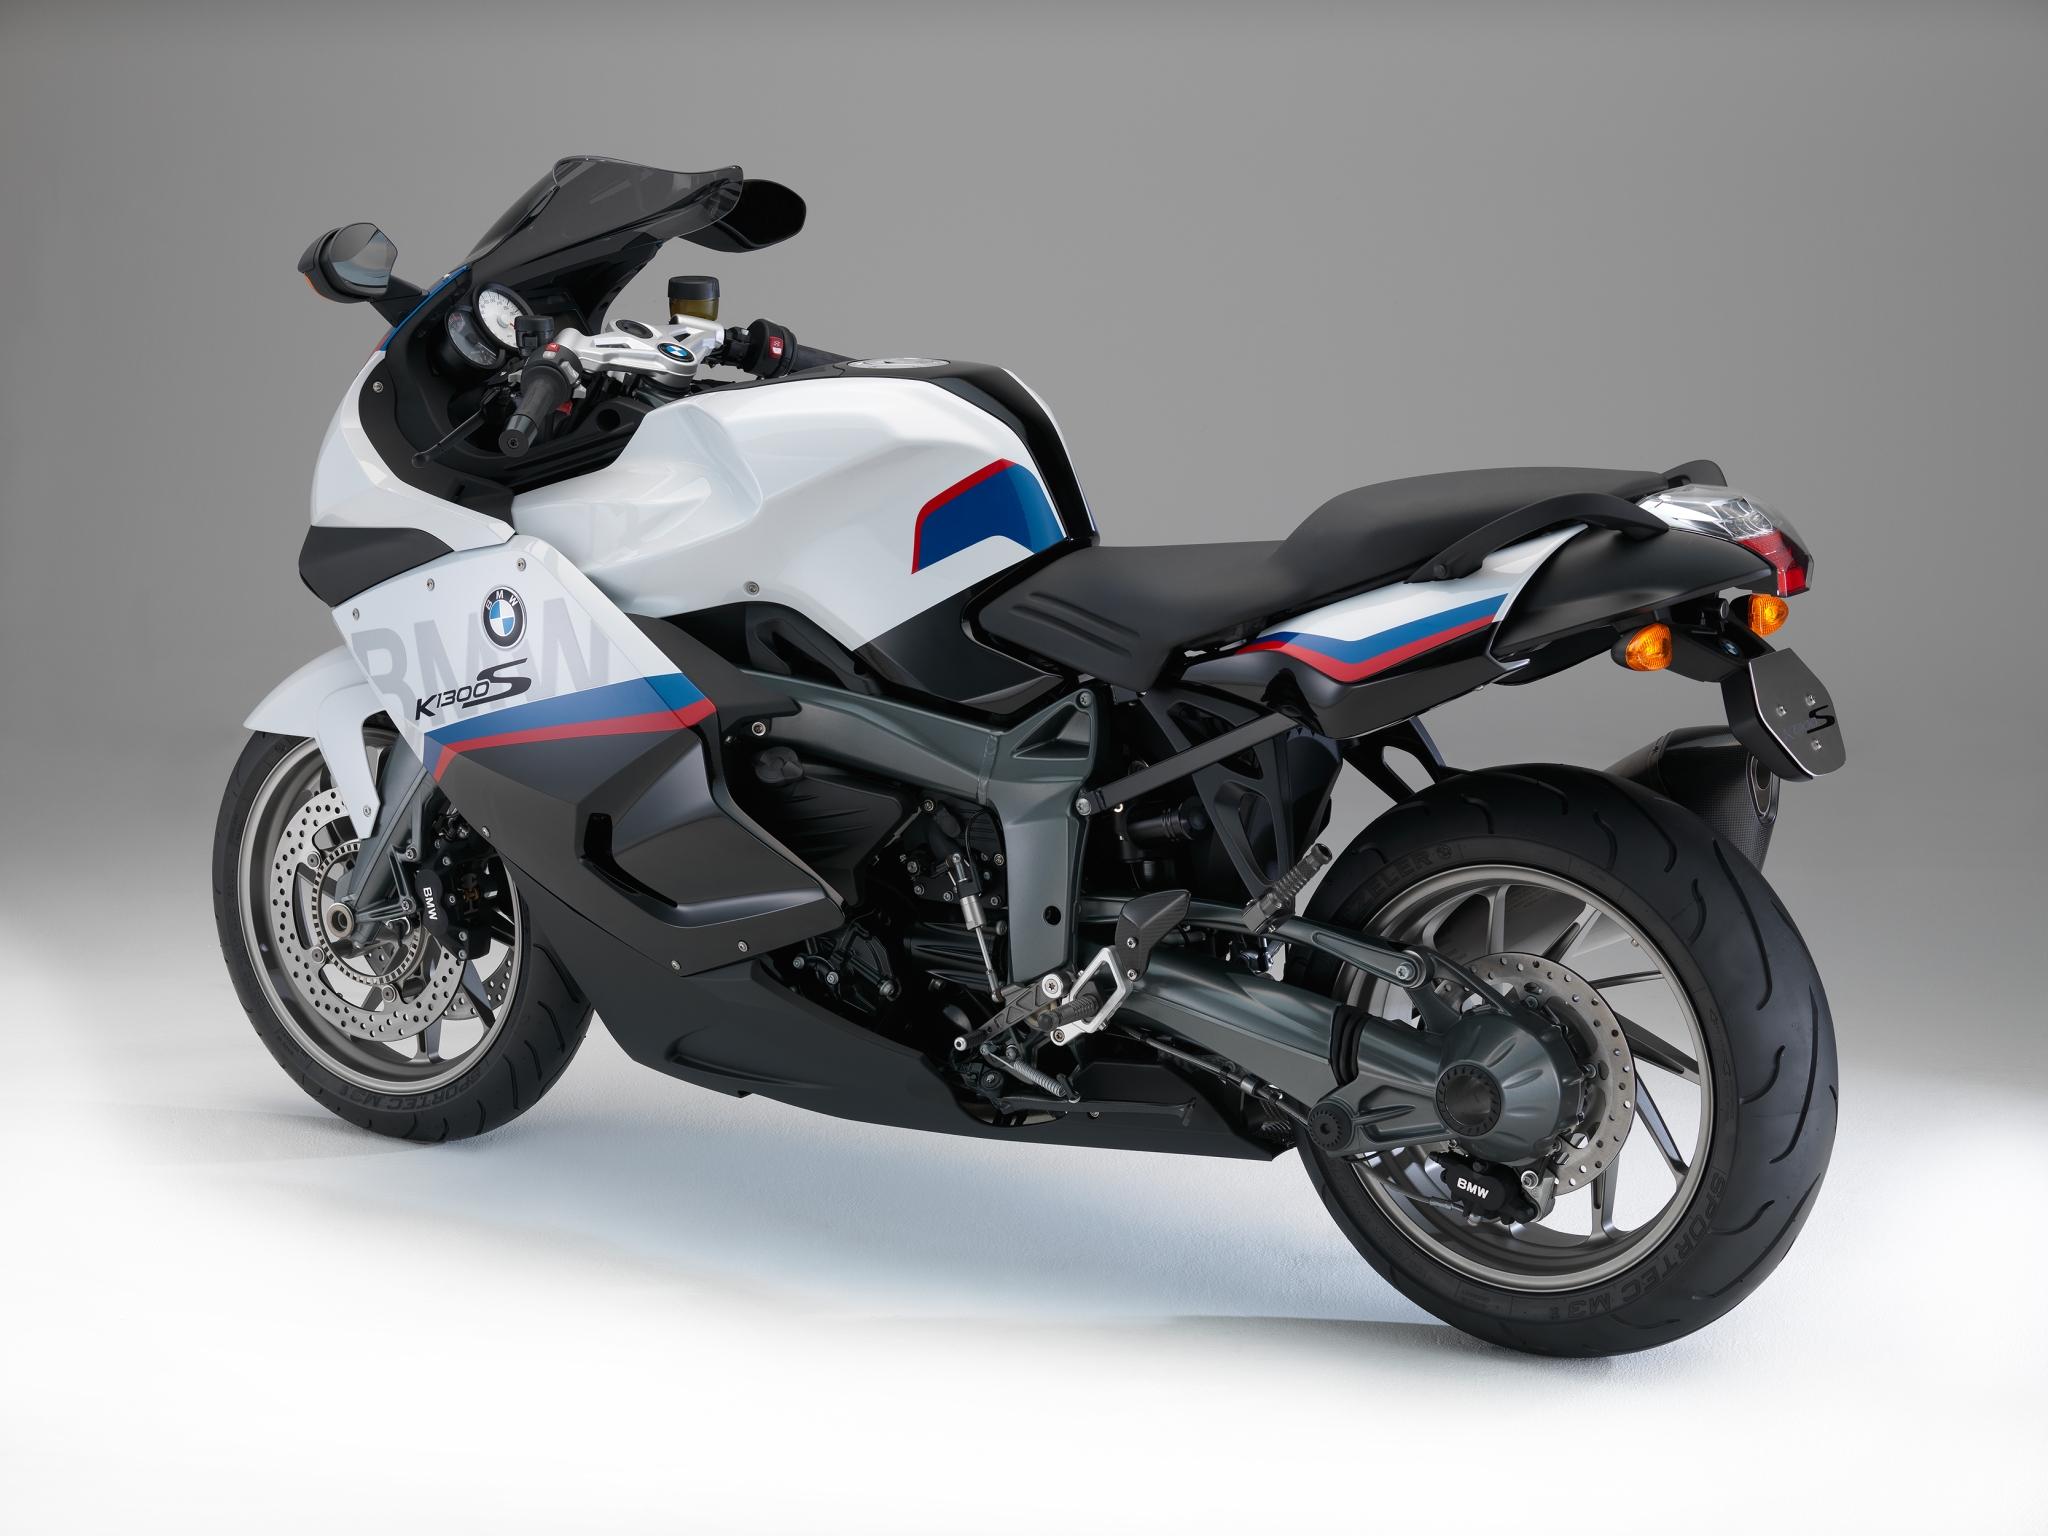 2015 BMW K1300S Motorsport Revealed - autoevolution